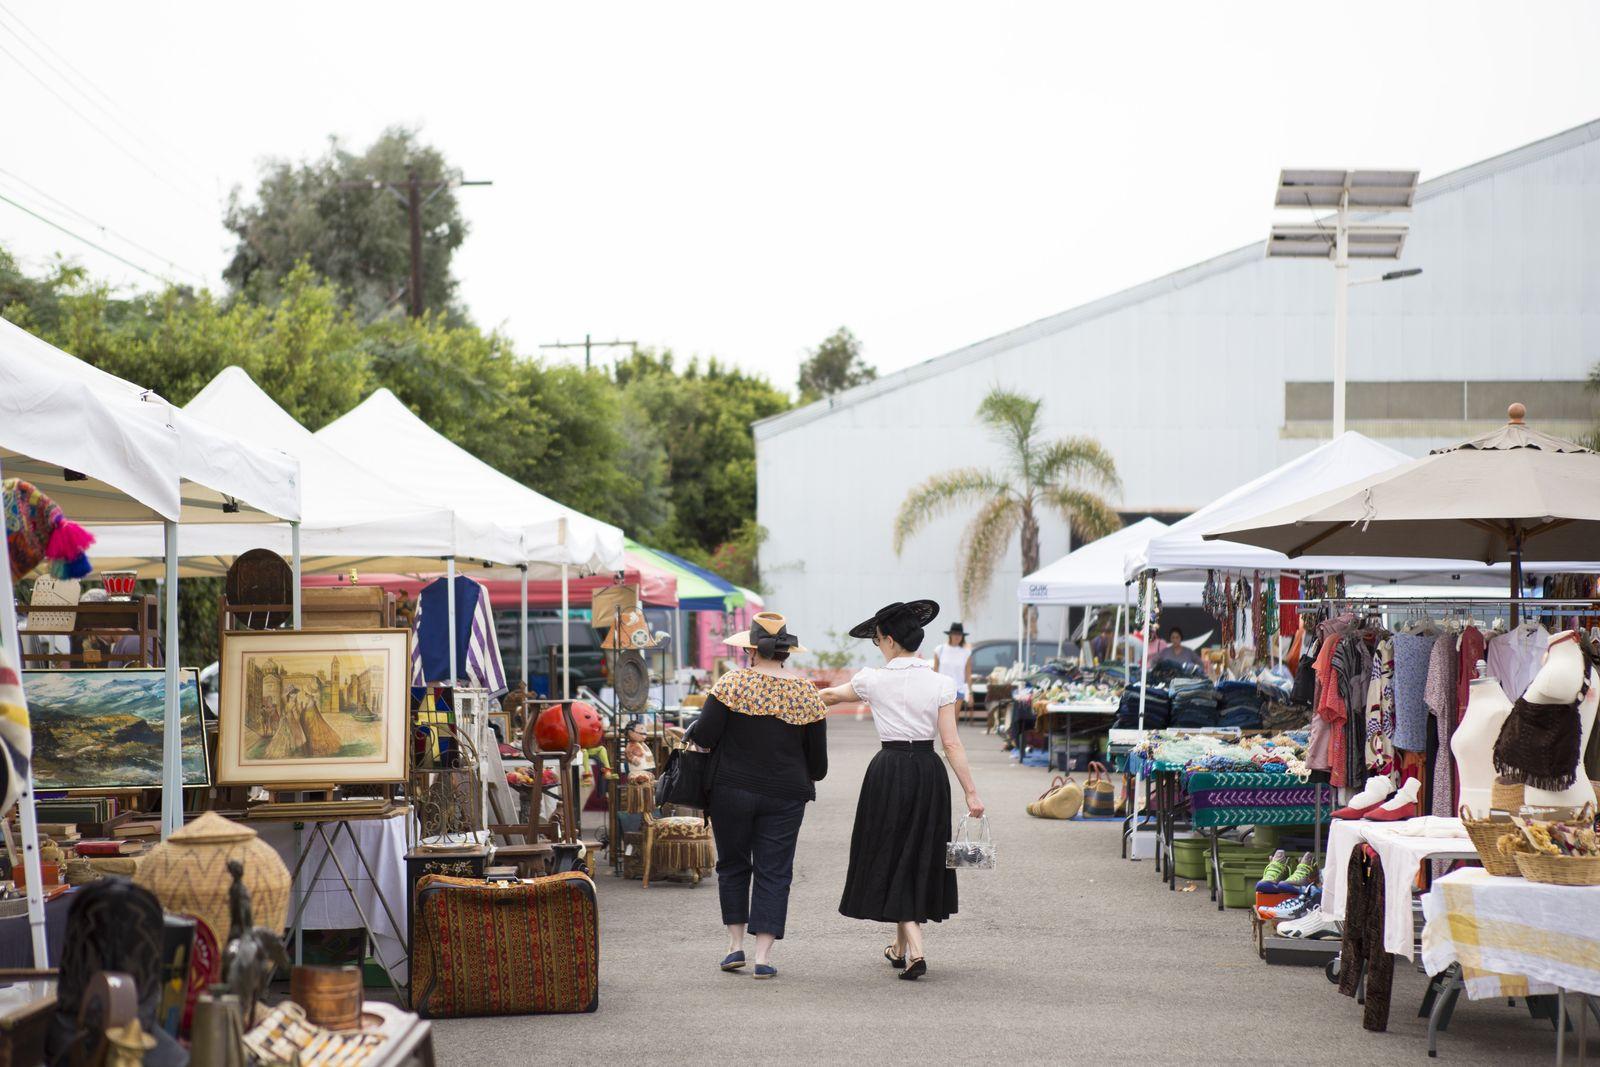 La s best flea markets for vintage treasure hunting for Antique fairs and flea markets 2016